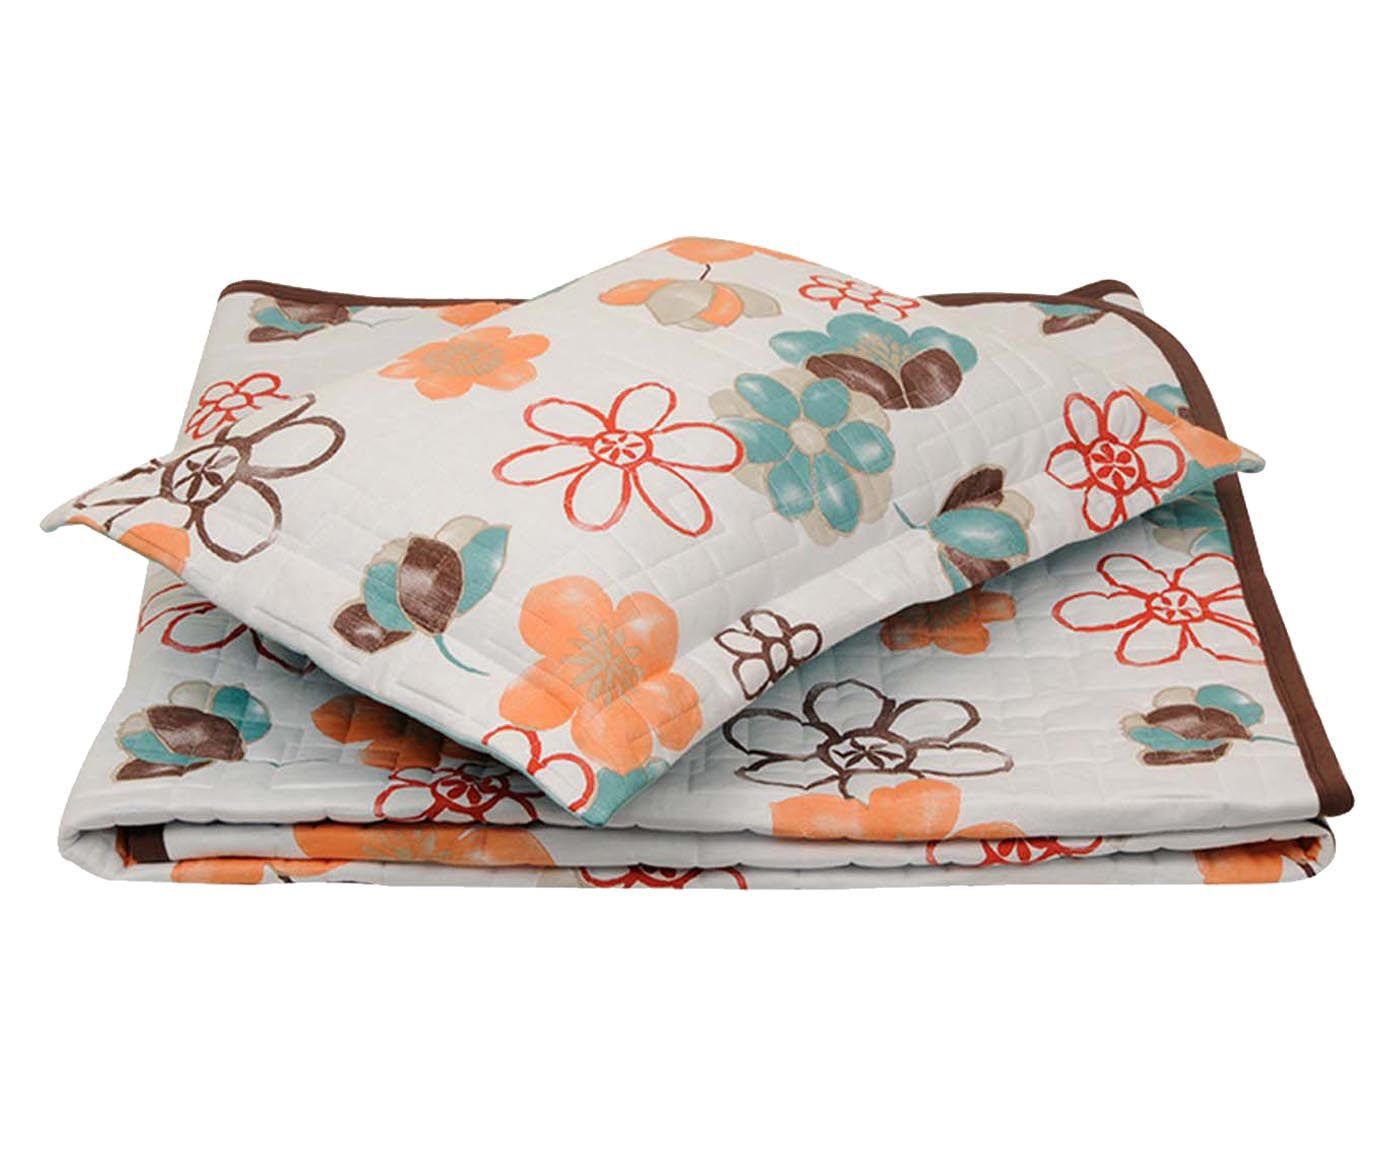 Conjunto de cobre-leito anne marie - para cama queen size | Westwing.com.br